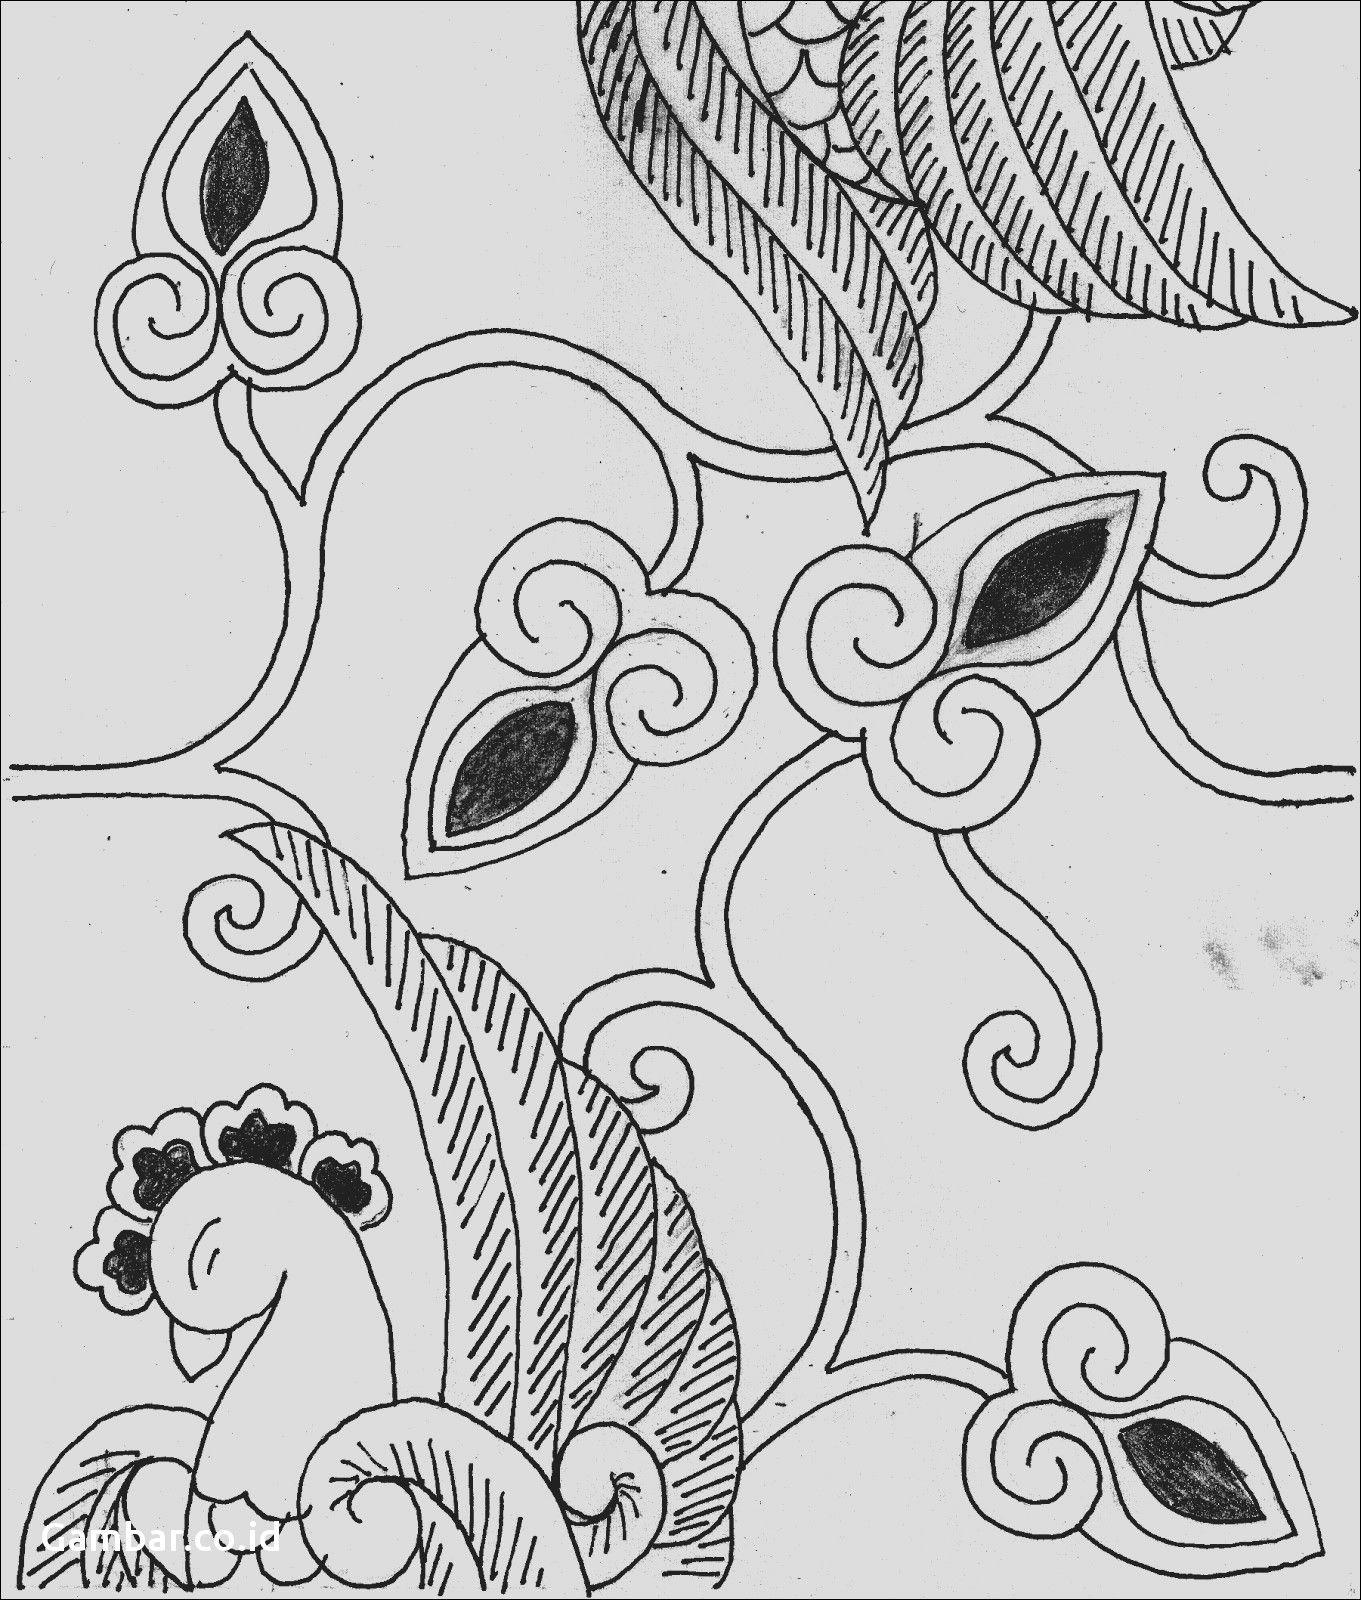 Download Gambar Sketsa Kupu Kupu Bajubatik Tech Page 14 Of 54 Seni Kreatif Gambar Sketsa